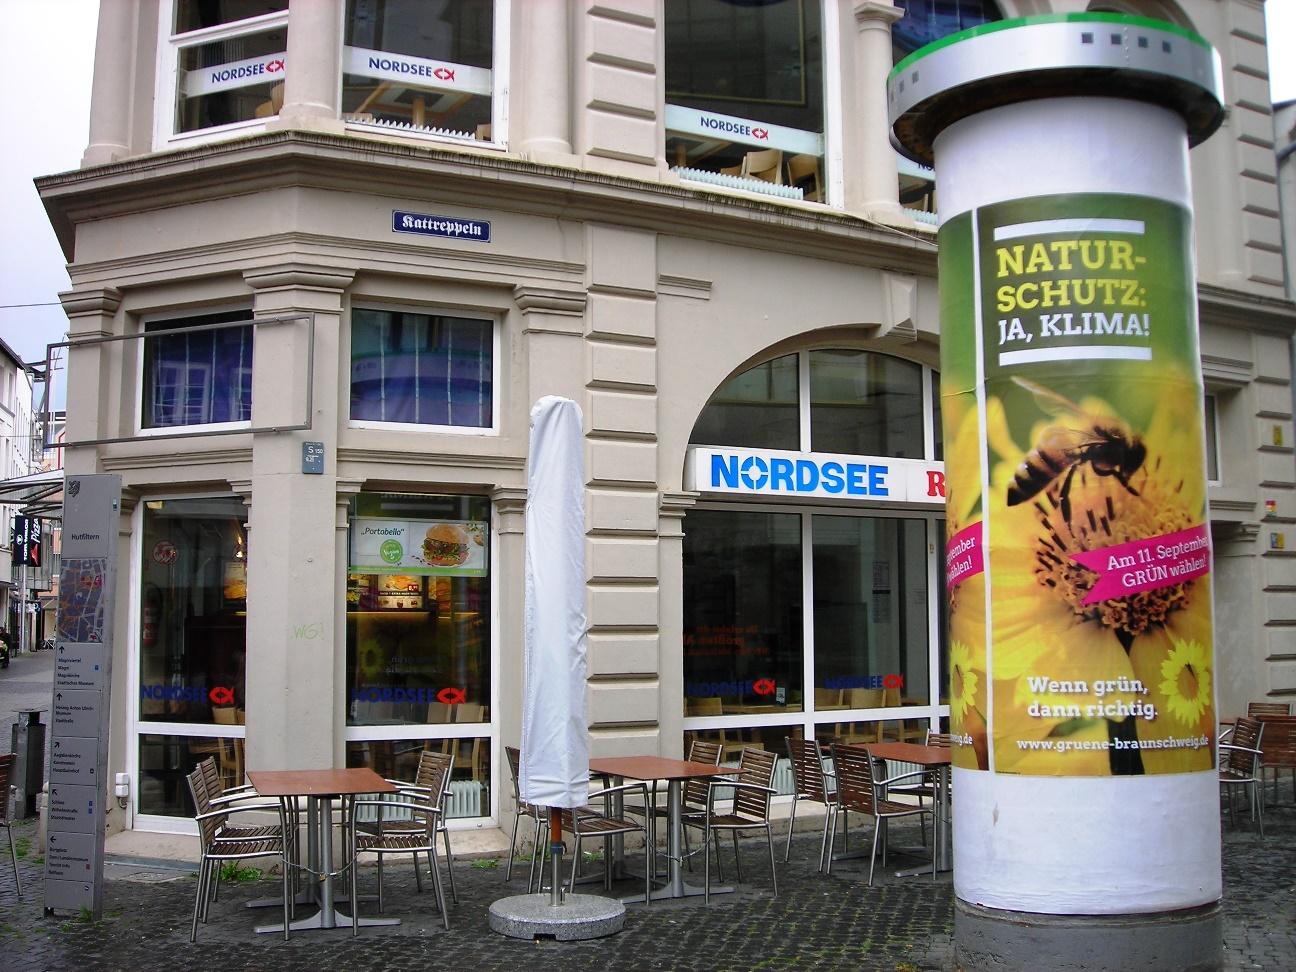 Grüne Werbung verschönert Braunschweig!